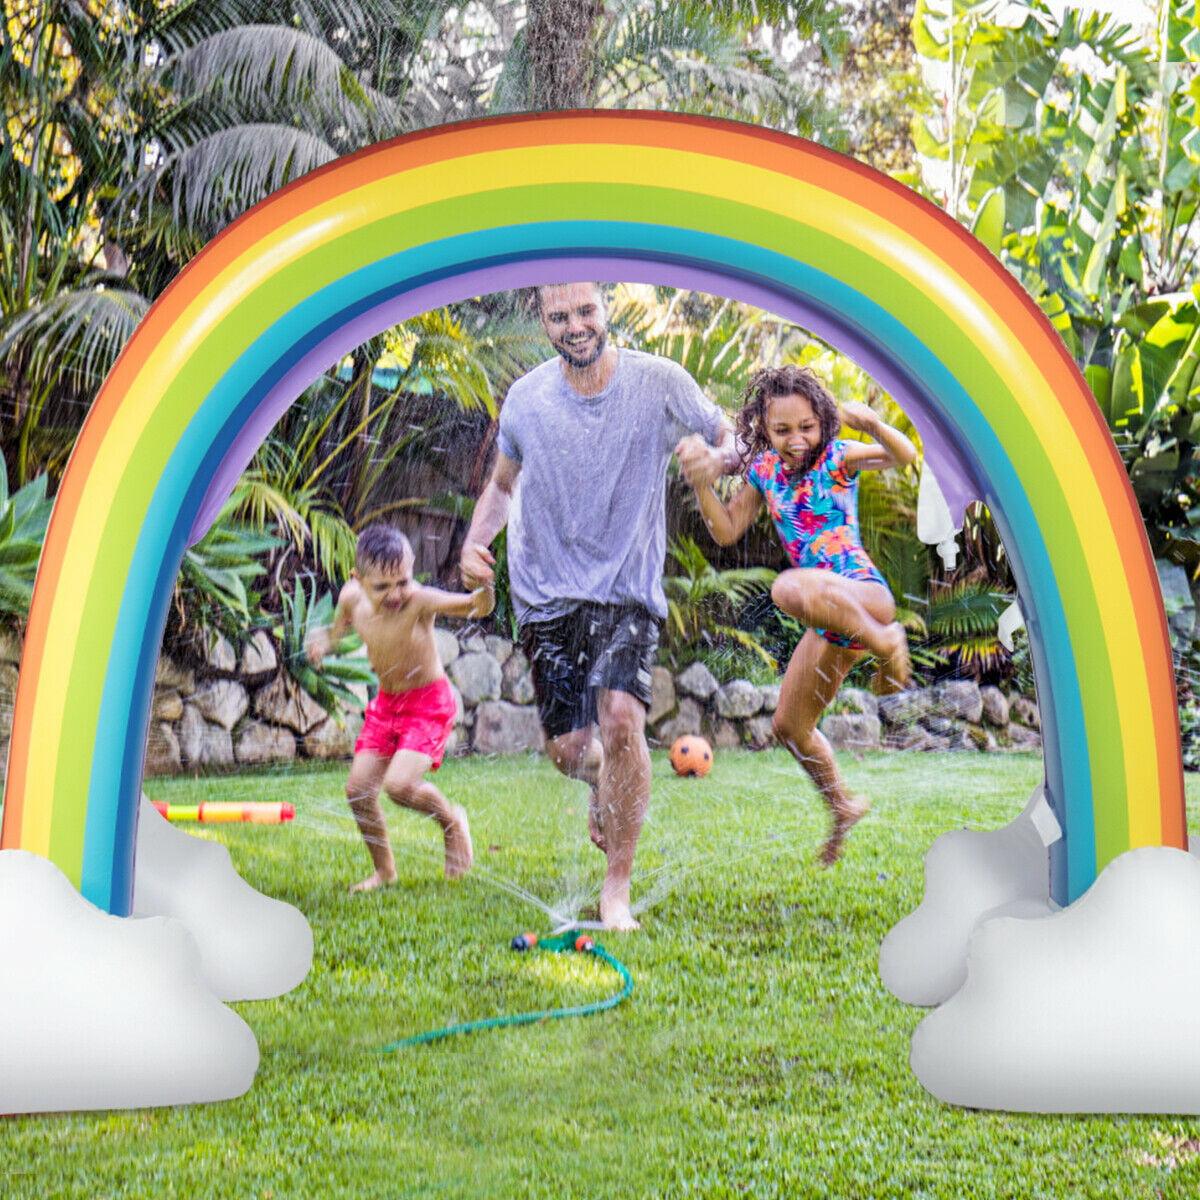 Gymax Inflatable Rainbow Sprinkler Backyard Games Summer Outside ...